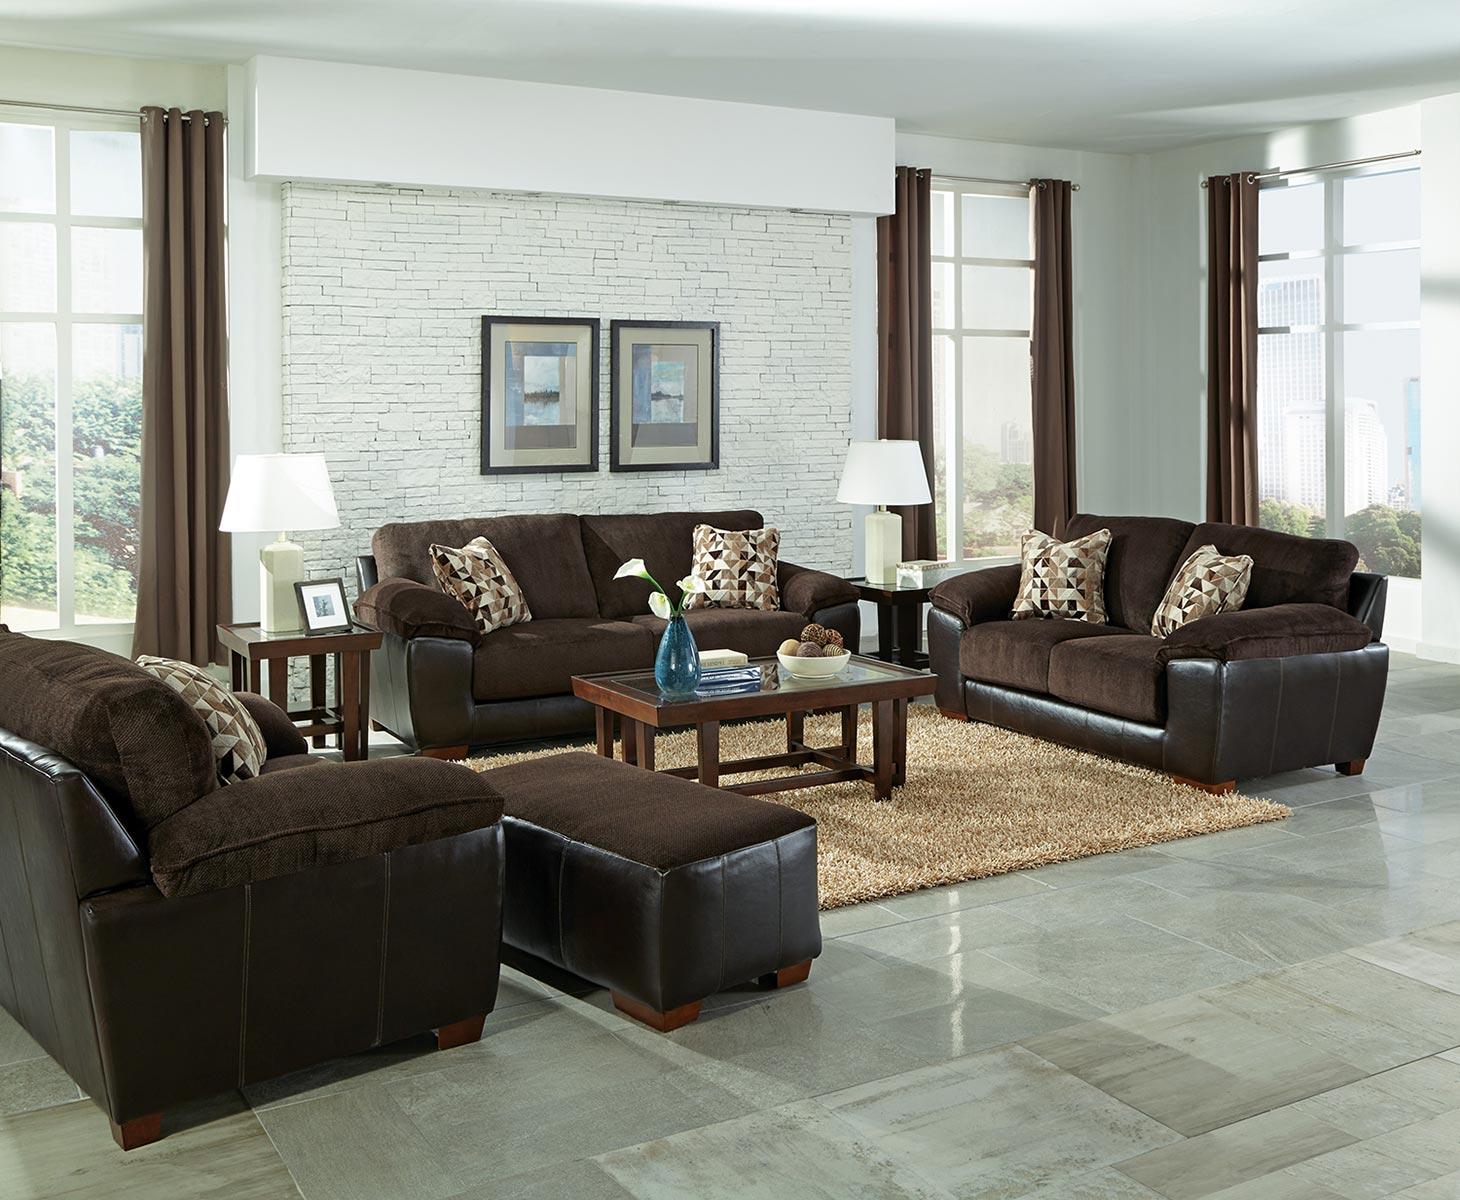 Jackson Pinson Sofa Set - Chocolate